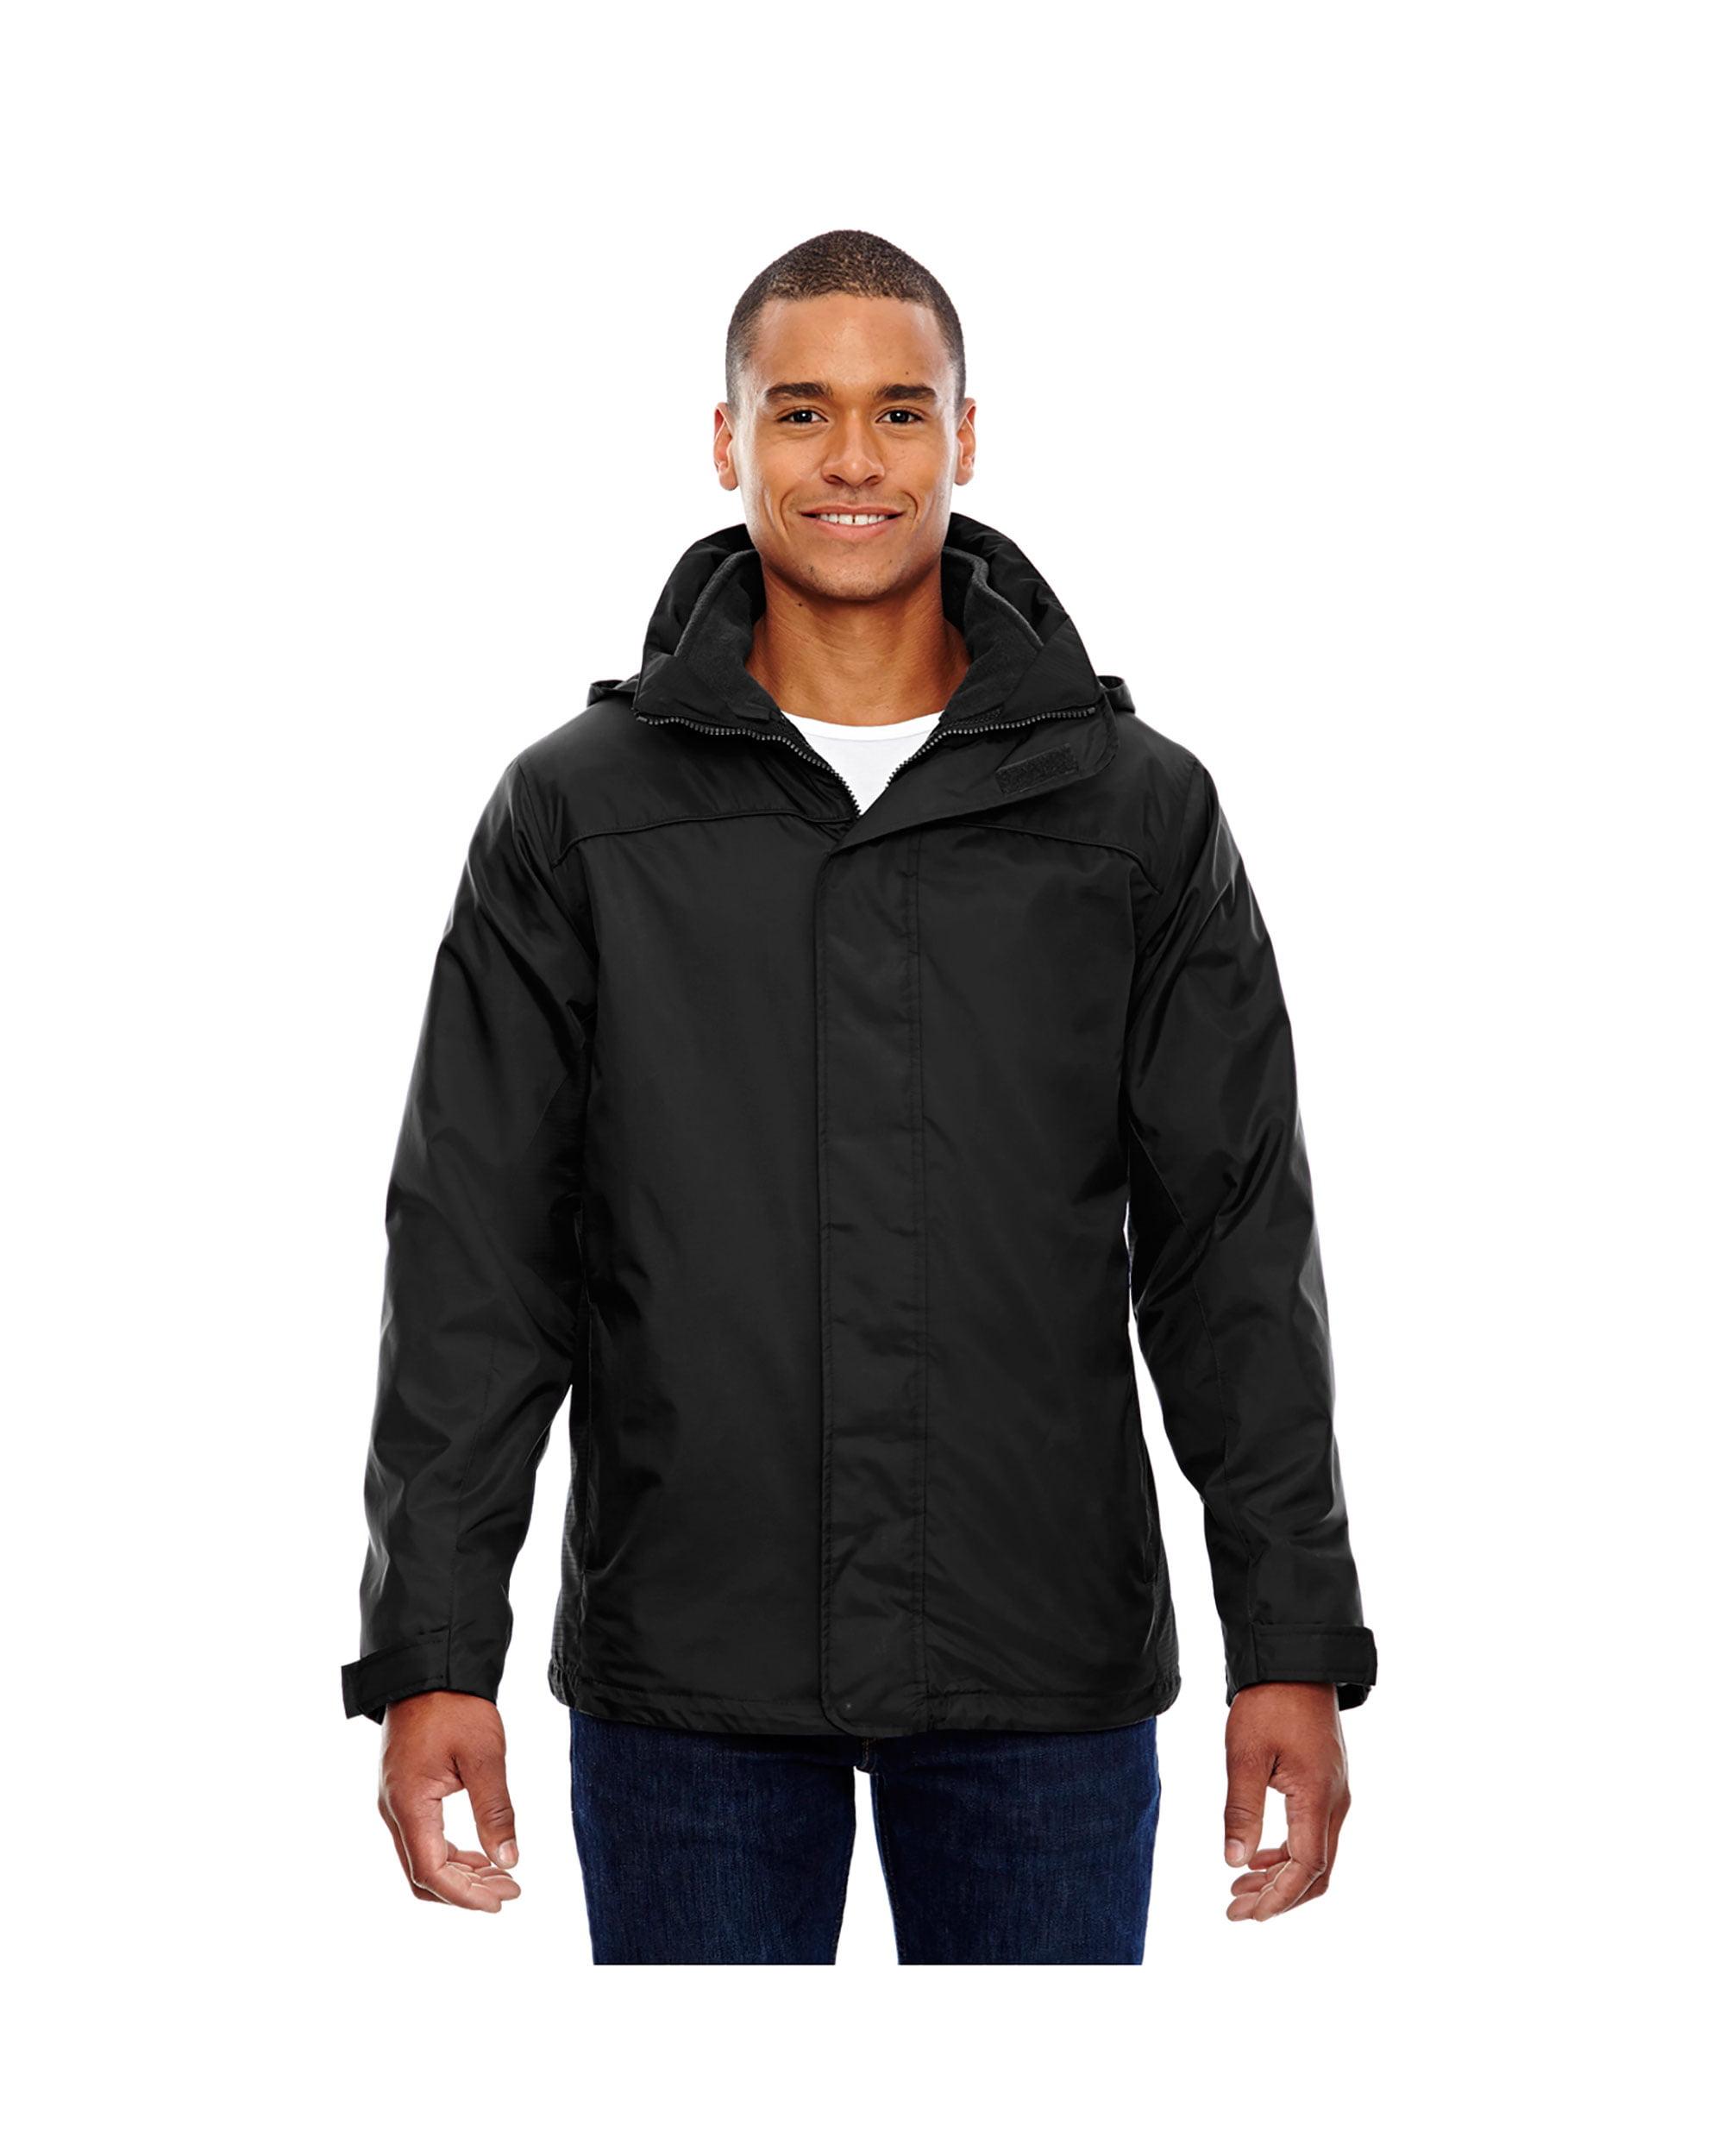 North End Mens Adjustable Snap Hood 3-in-1 Jacket